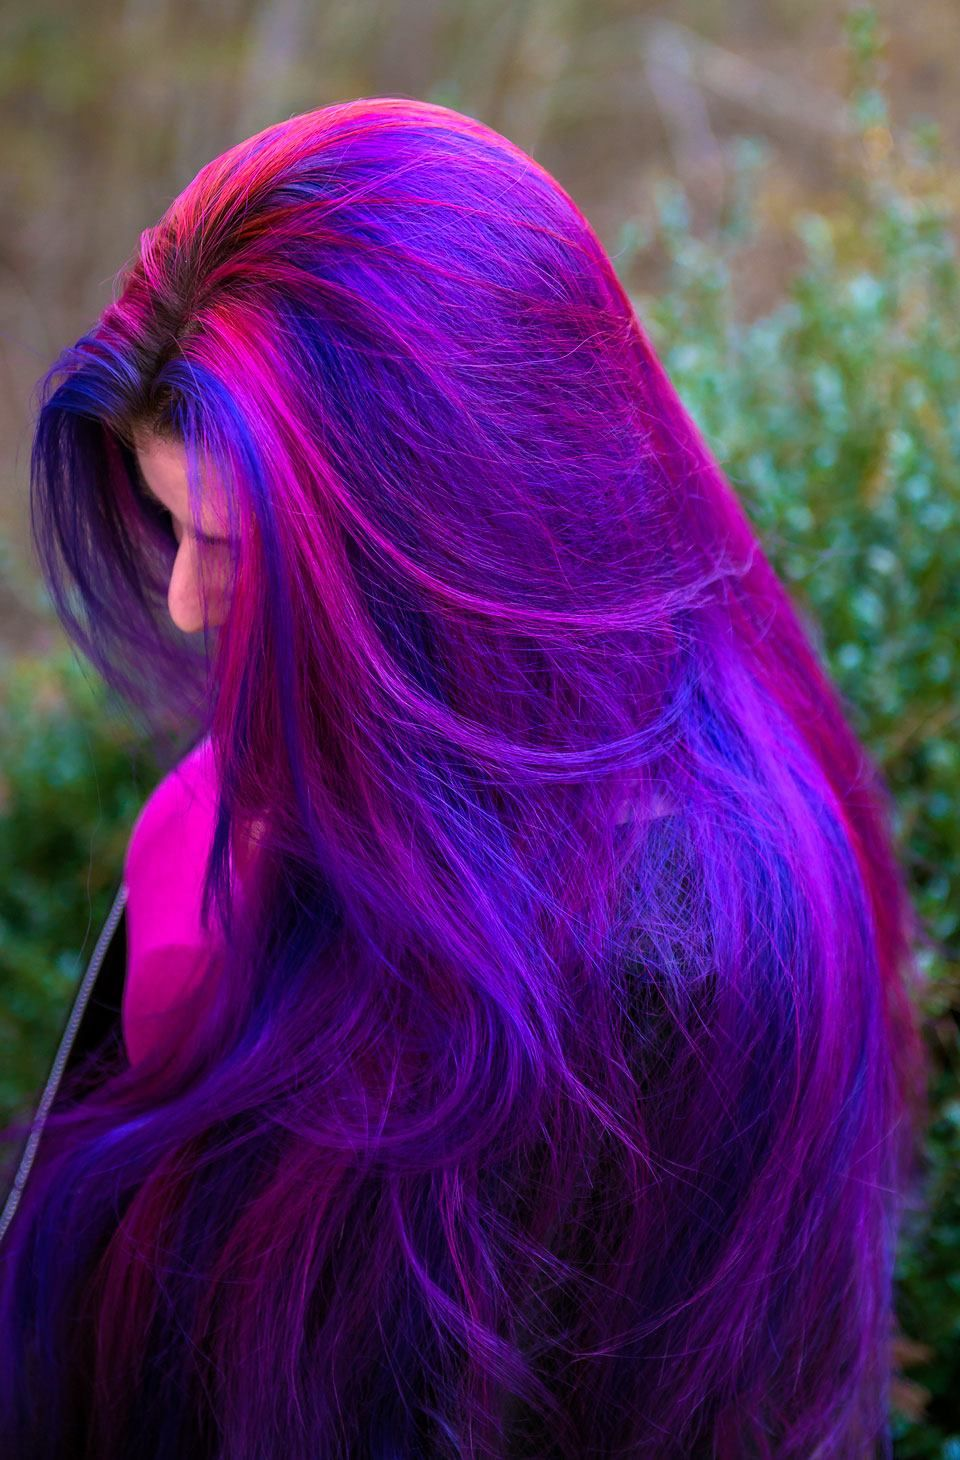 Stunning Color Lizzie Davis On Facebook Just Crazy